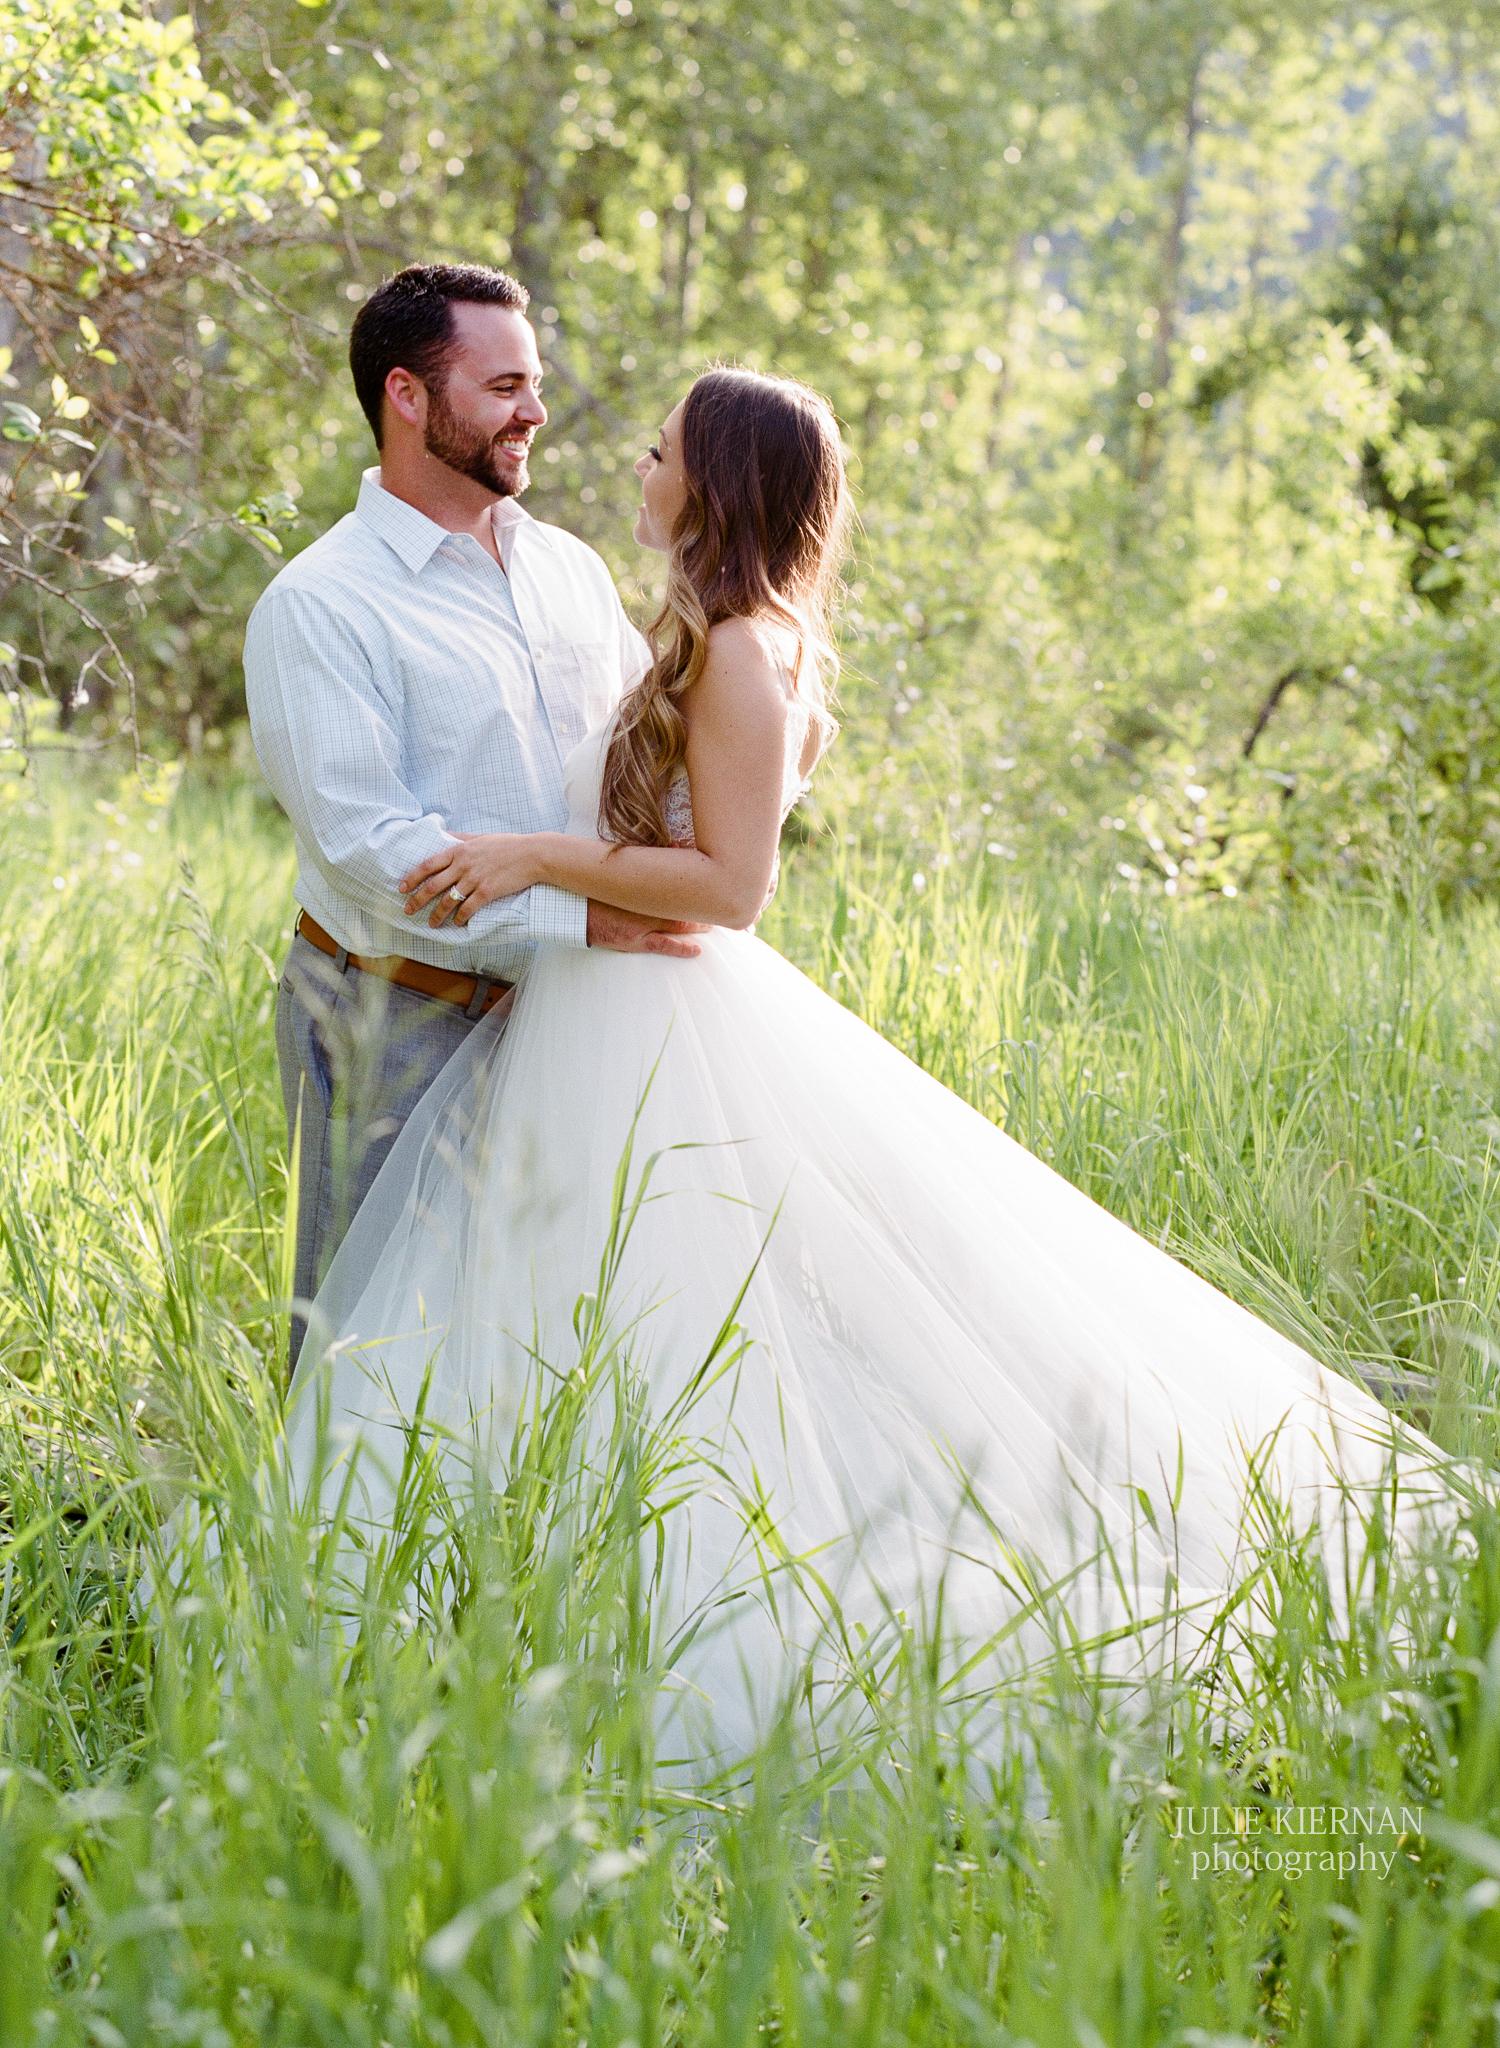 portfolio-Wedding-june-2016-film-p645n--1.jpg